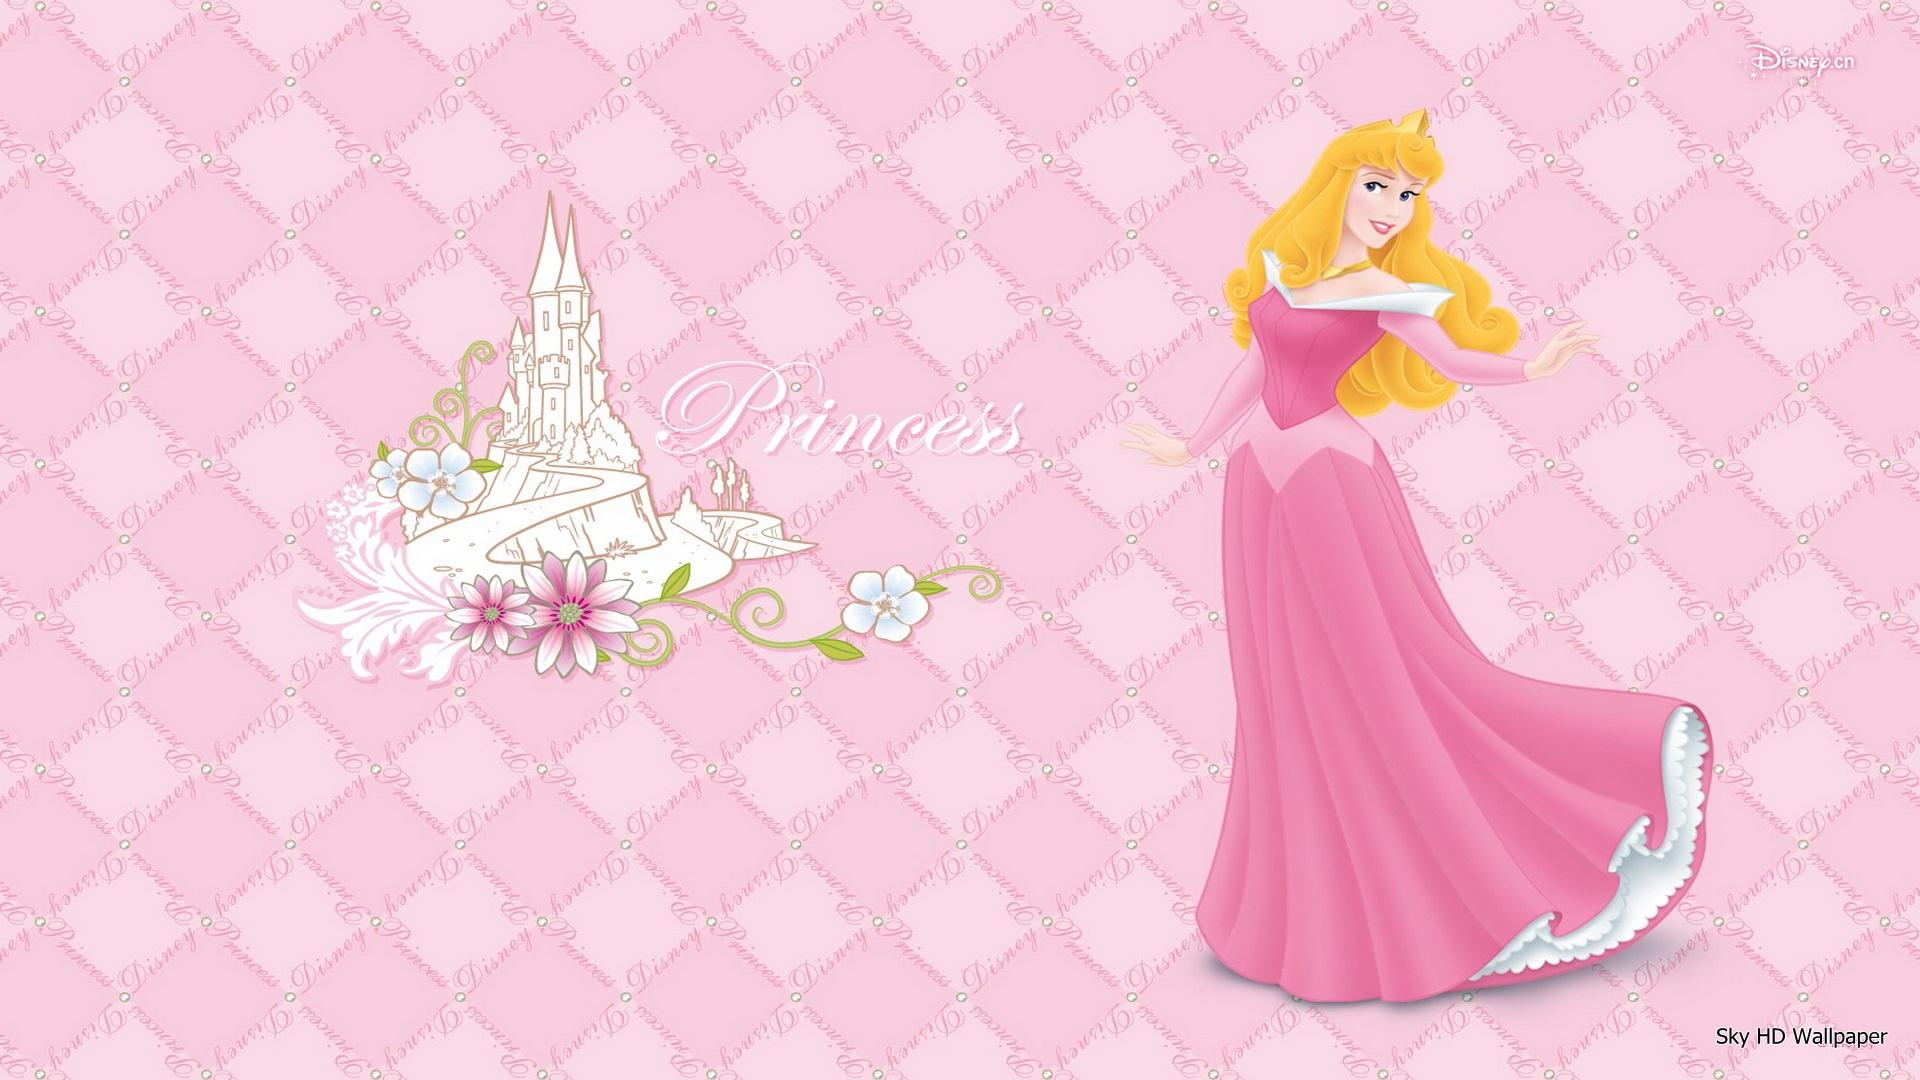 Dibujos princesas princesa aurora 1920x1080 thecheapjerseys Images